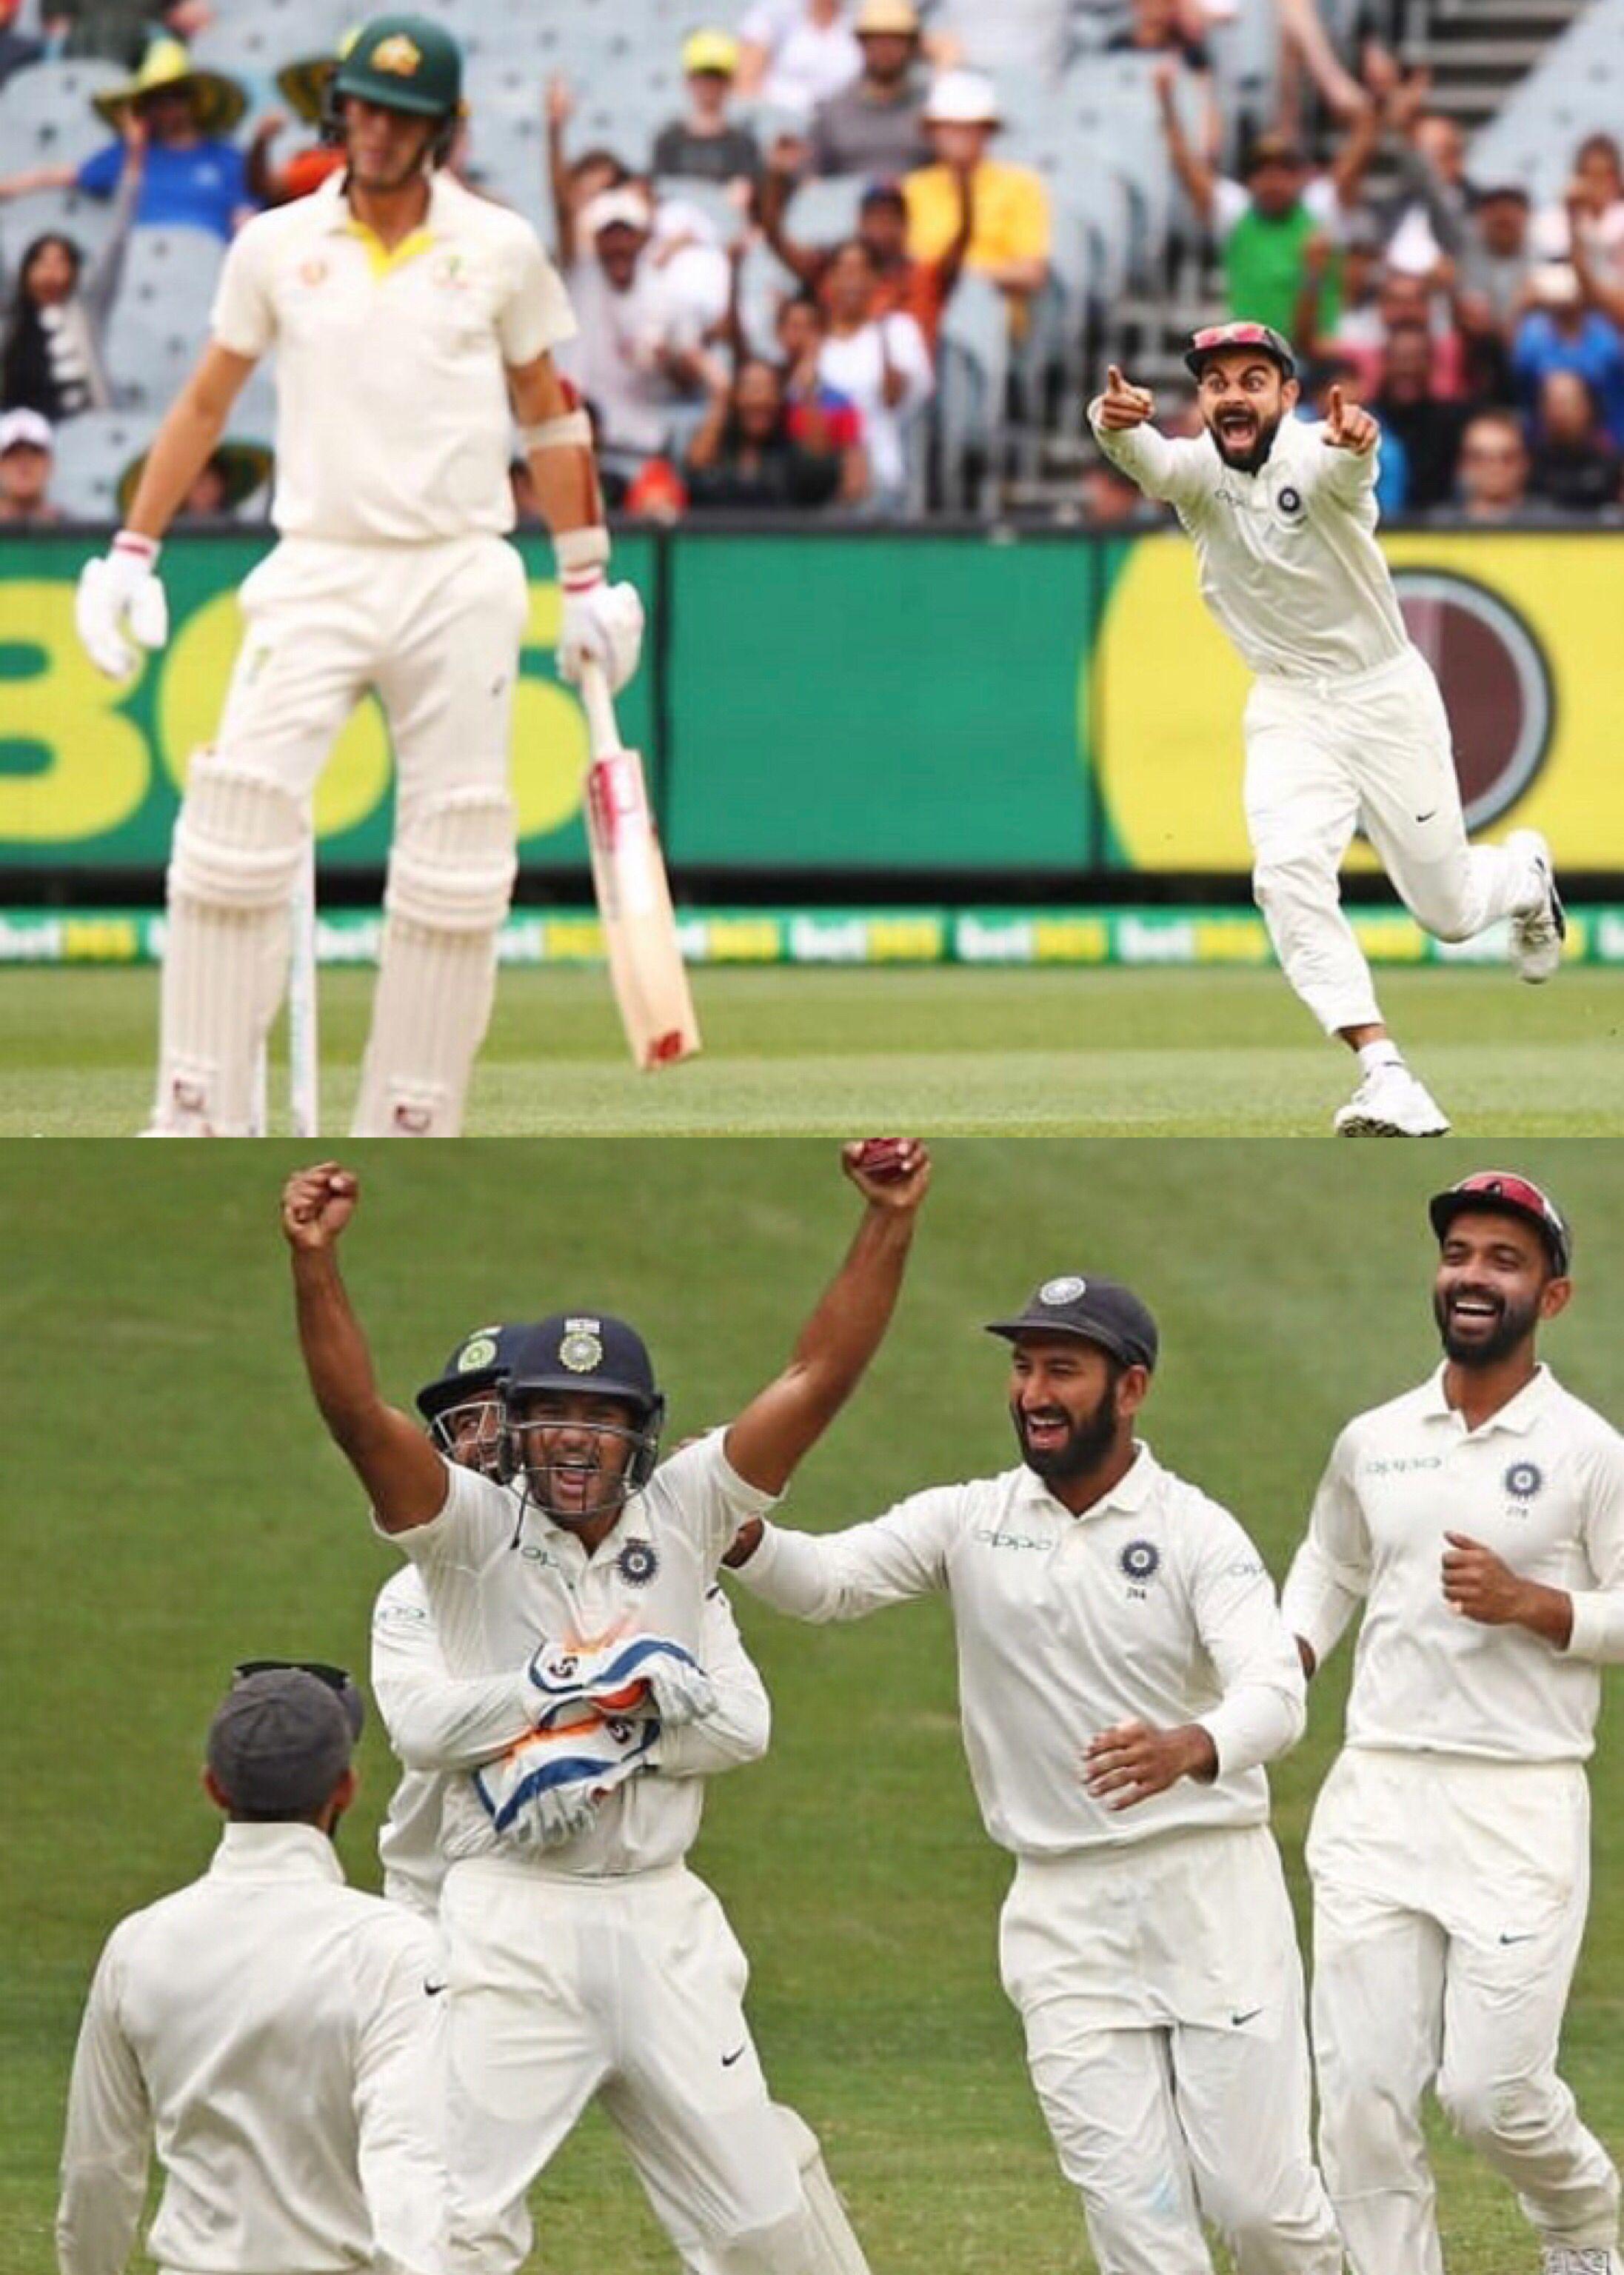 Team India Latest Cricket News Cricket Update Cricket News